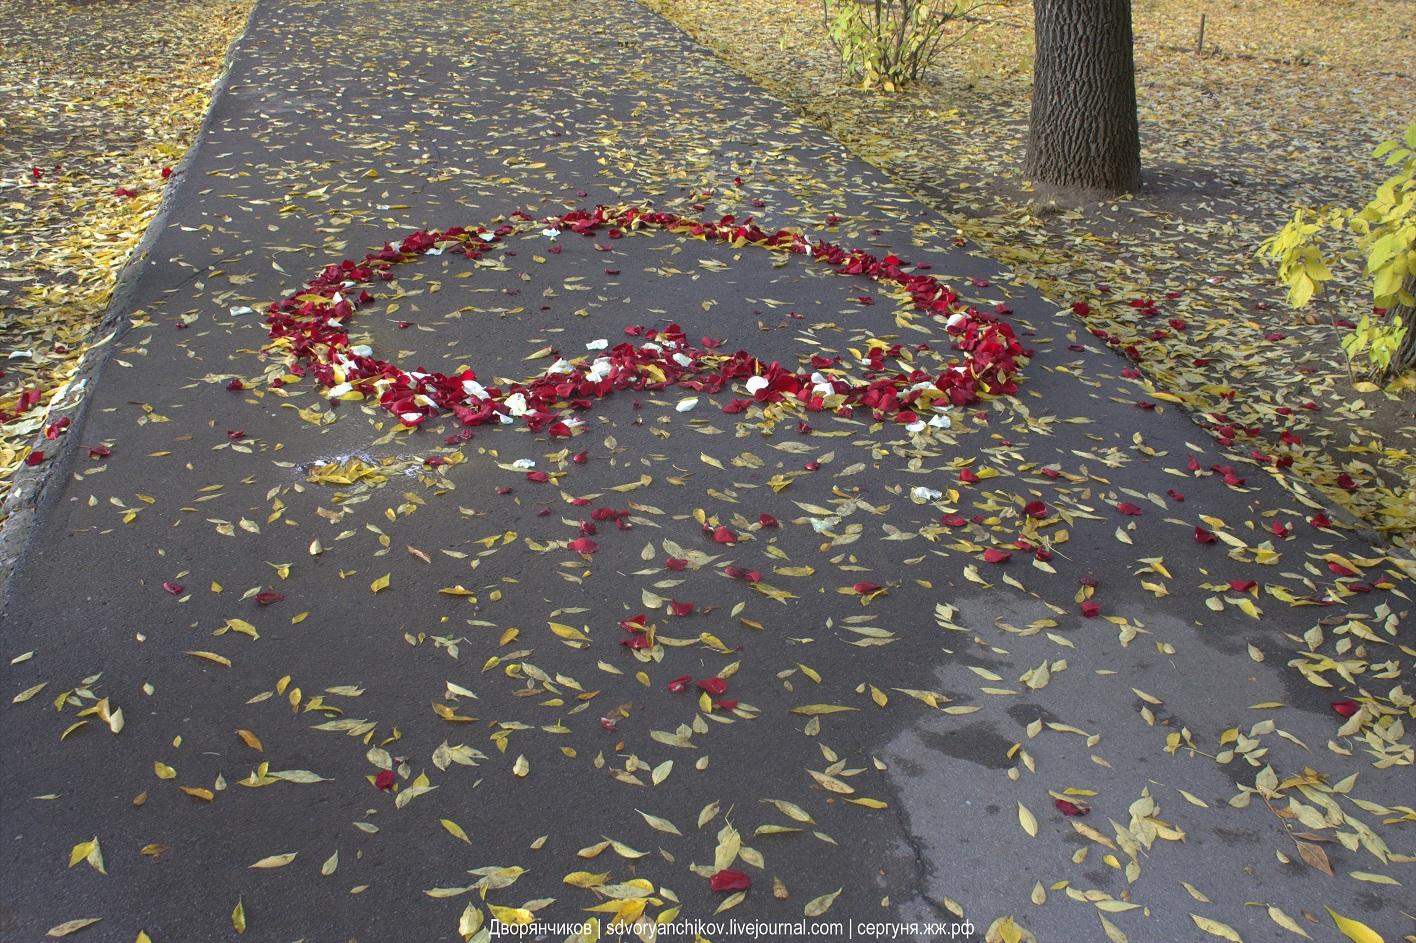 Сердце из лепестков роз - парк вгс - 14-10-2017